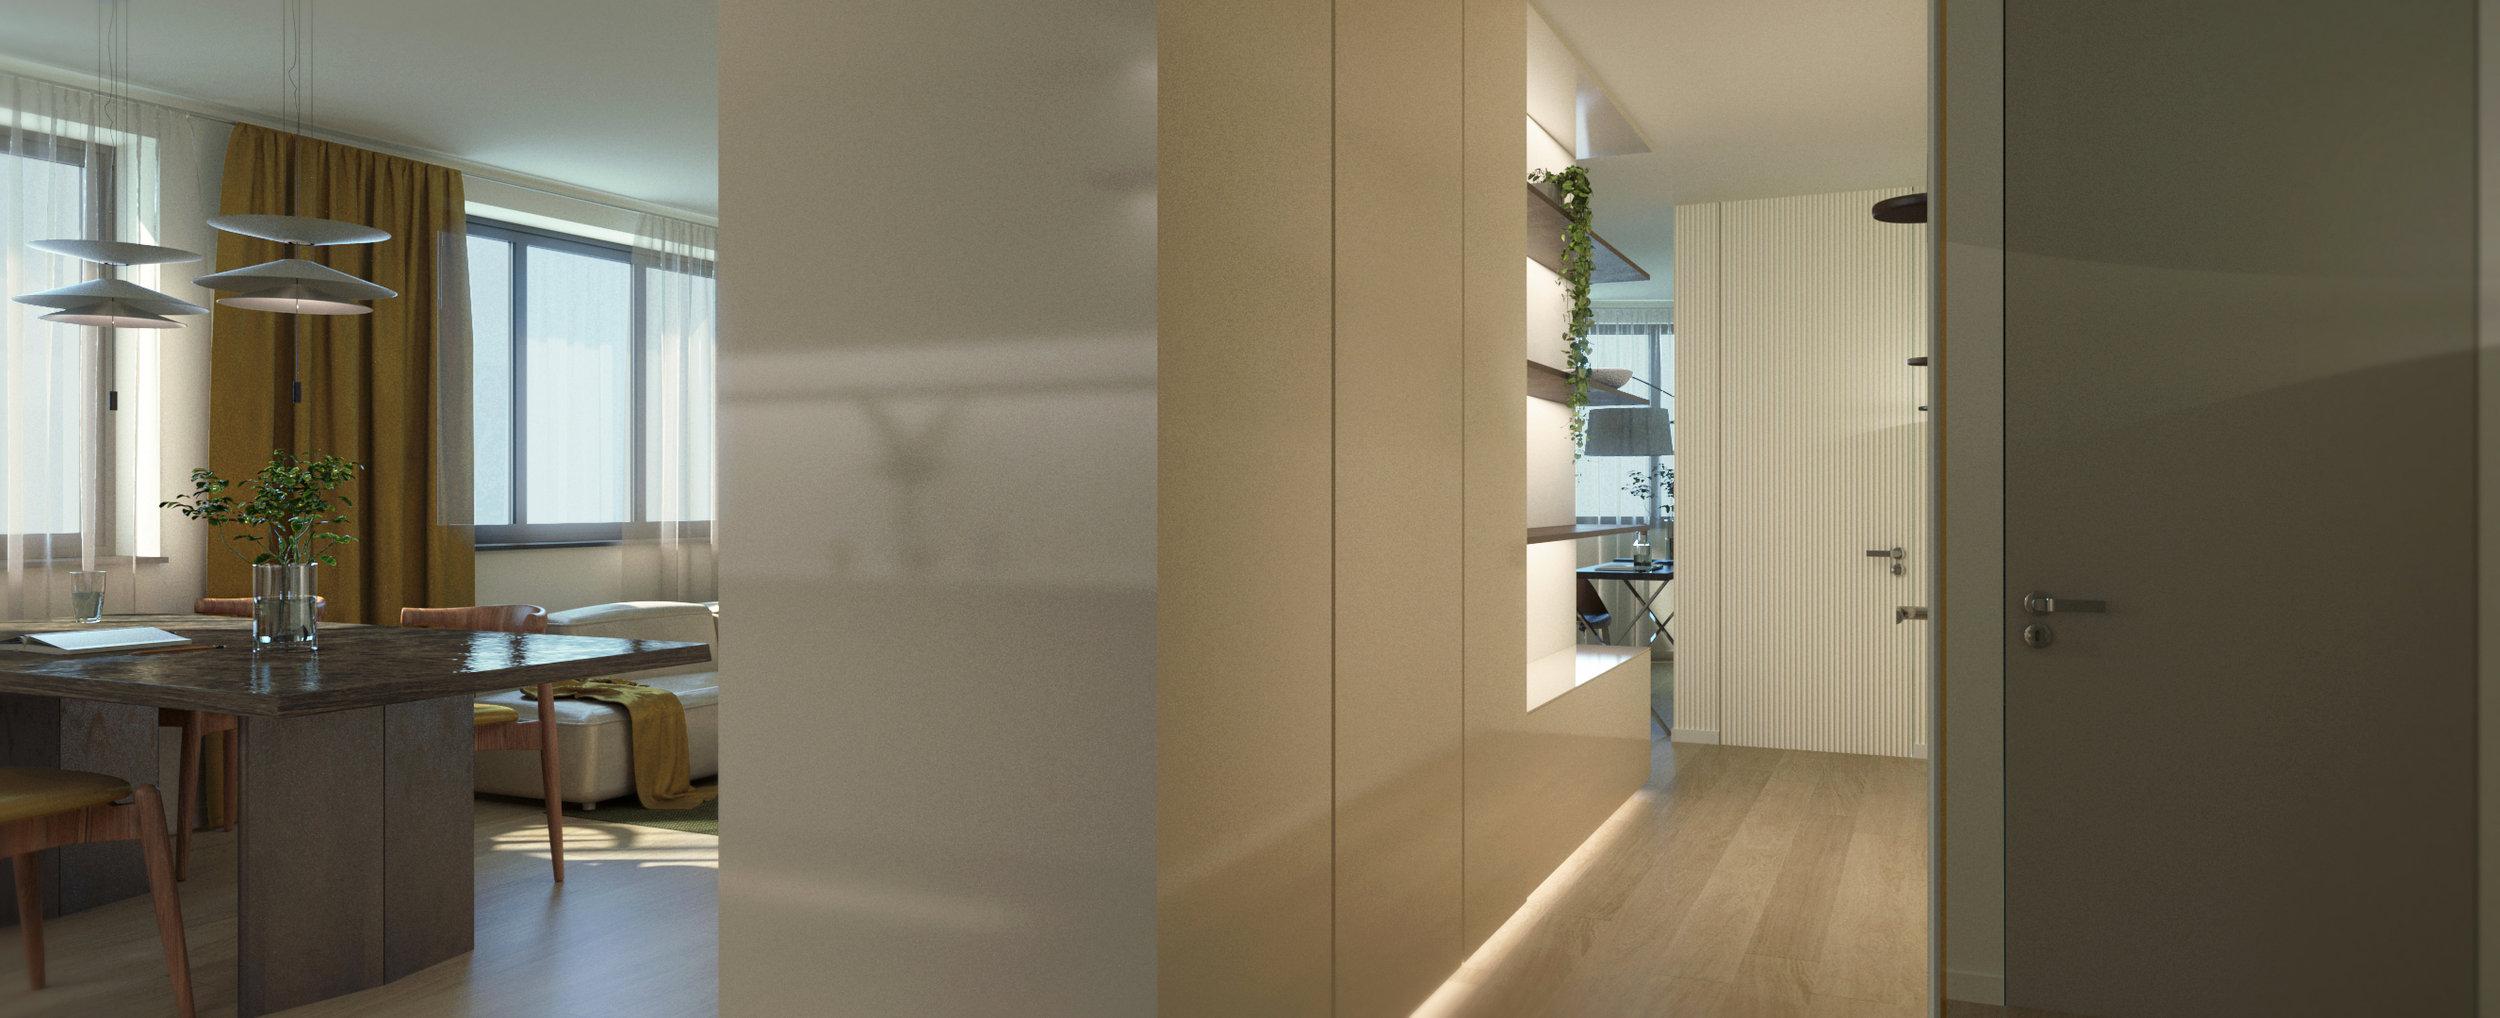 London_Apartment_Gila_Shemie_Zakay_Bre (10).jpg